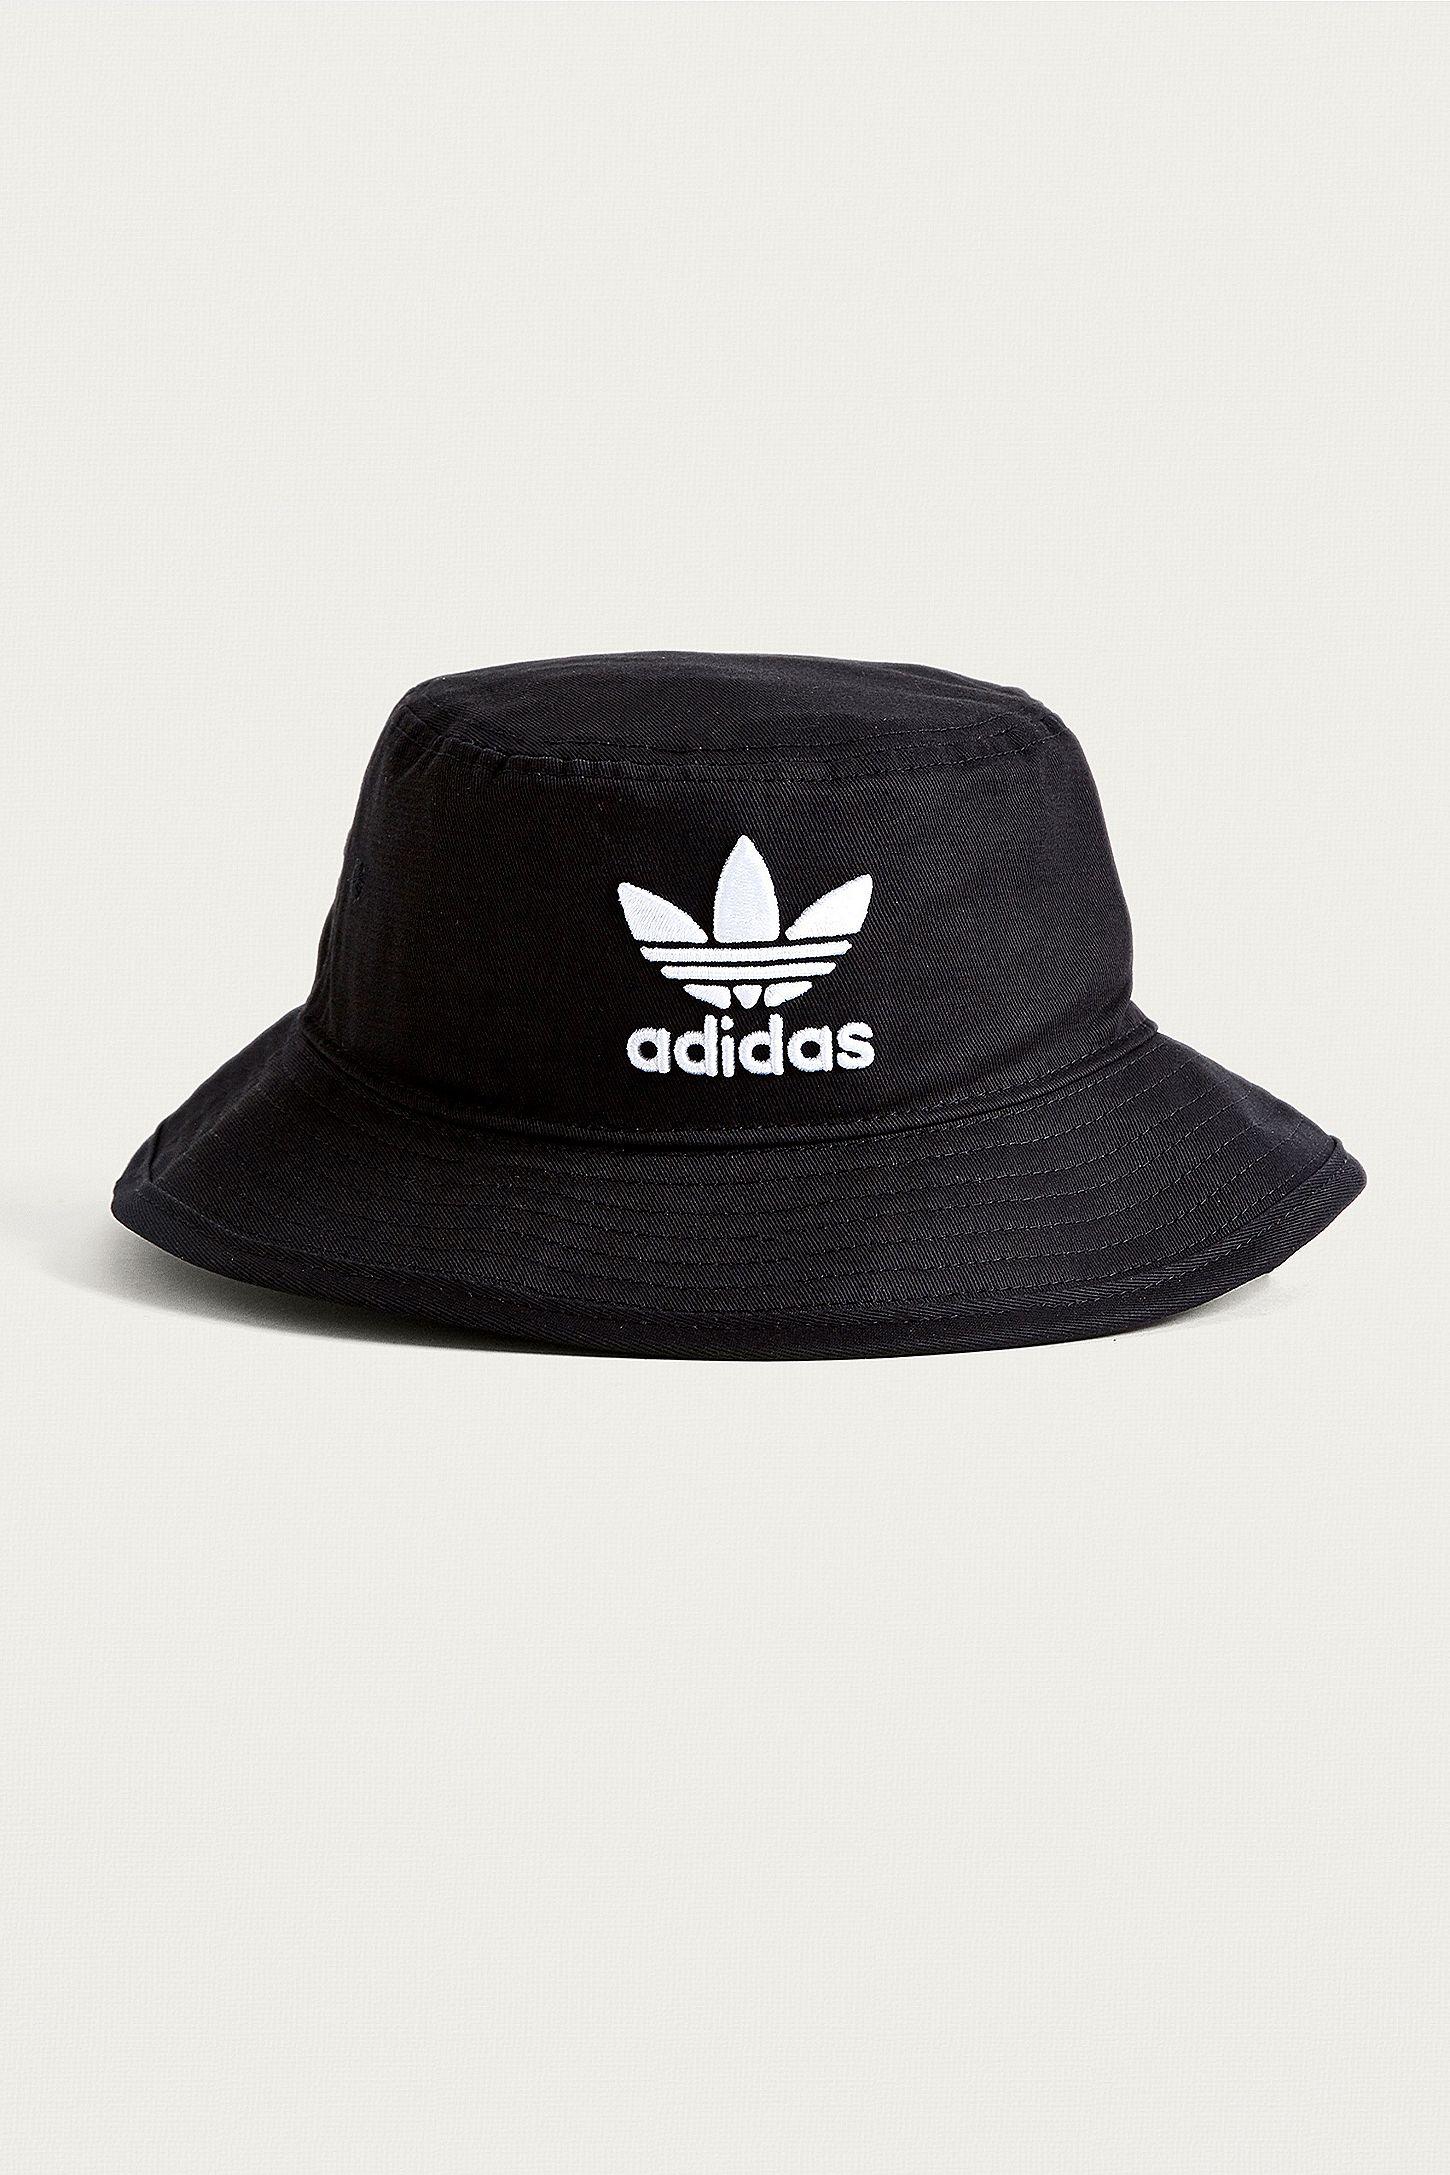 9b734c1376d adidas Originals Black Trefoil Bucket Hat